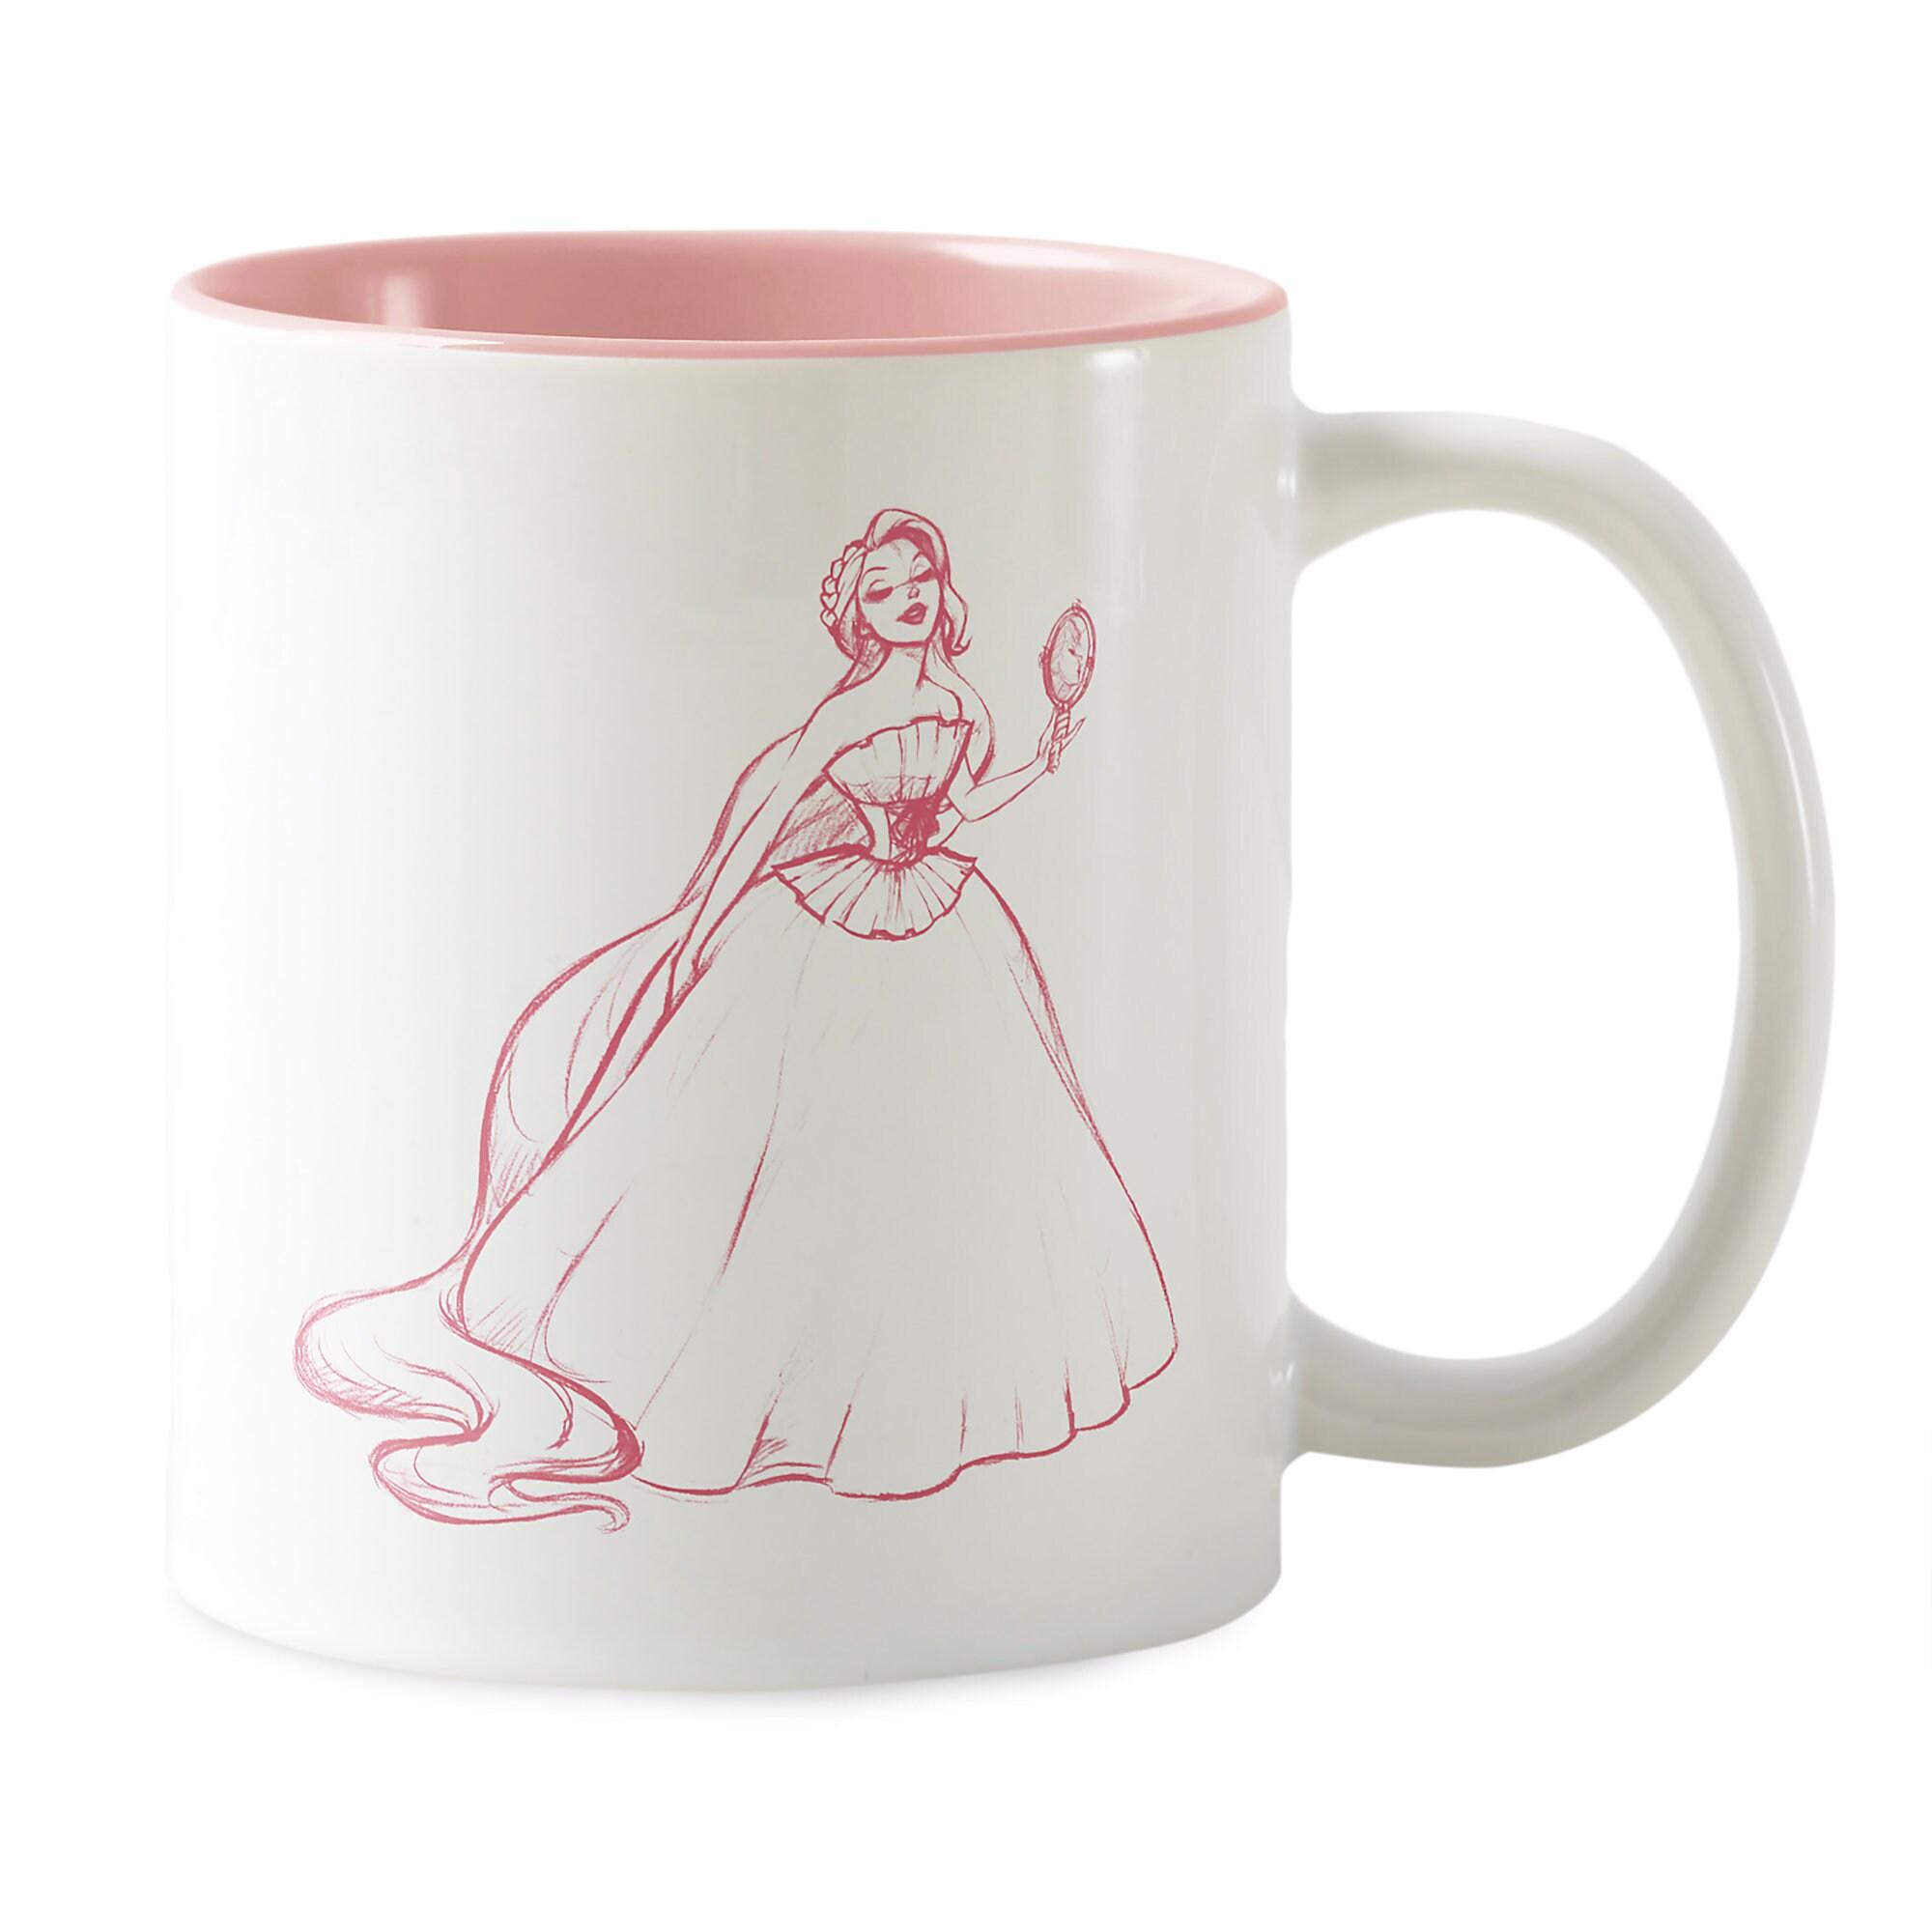 Rapunzel Mug - Art of Princess Designer Collection